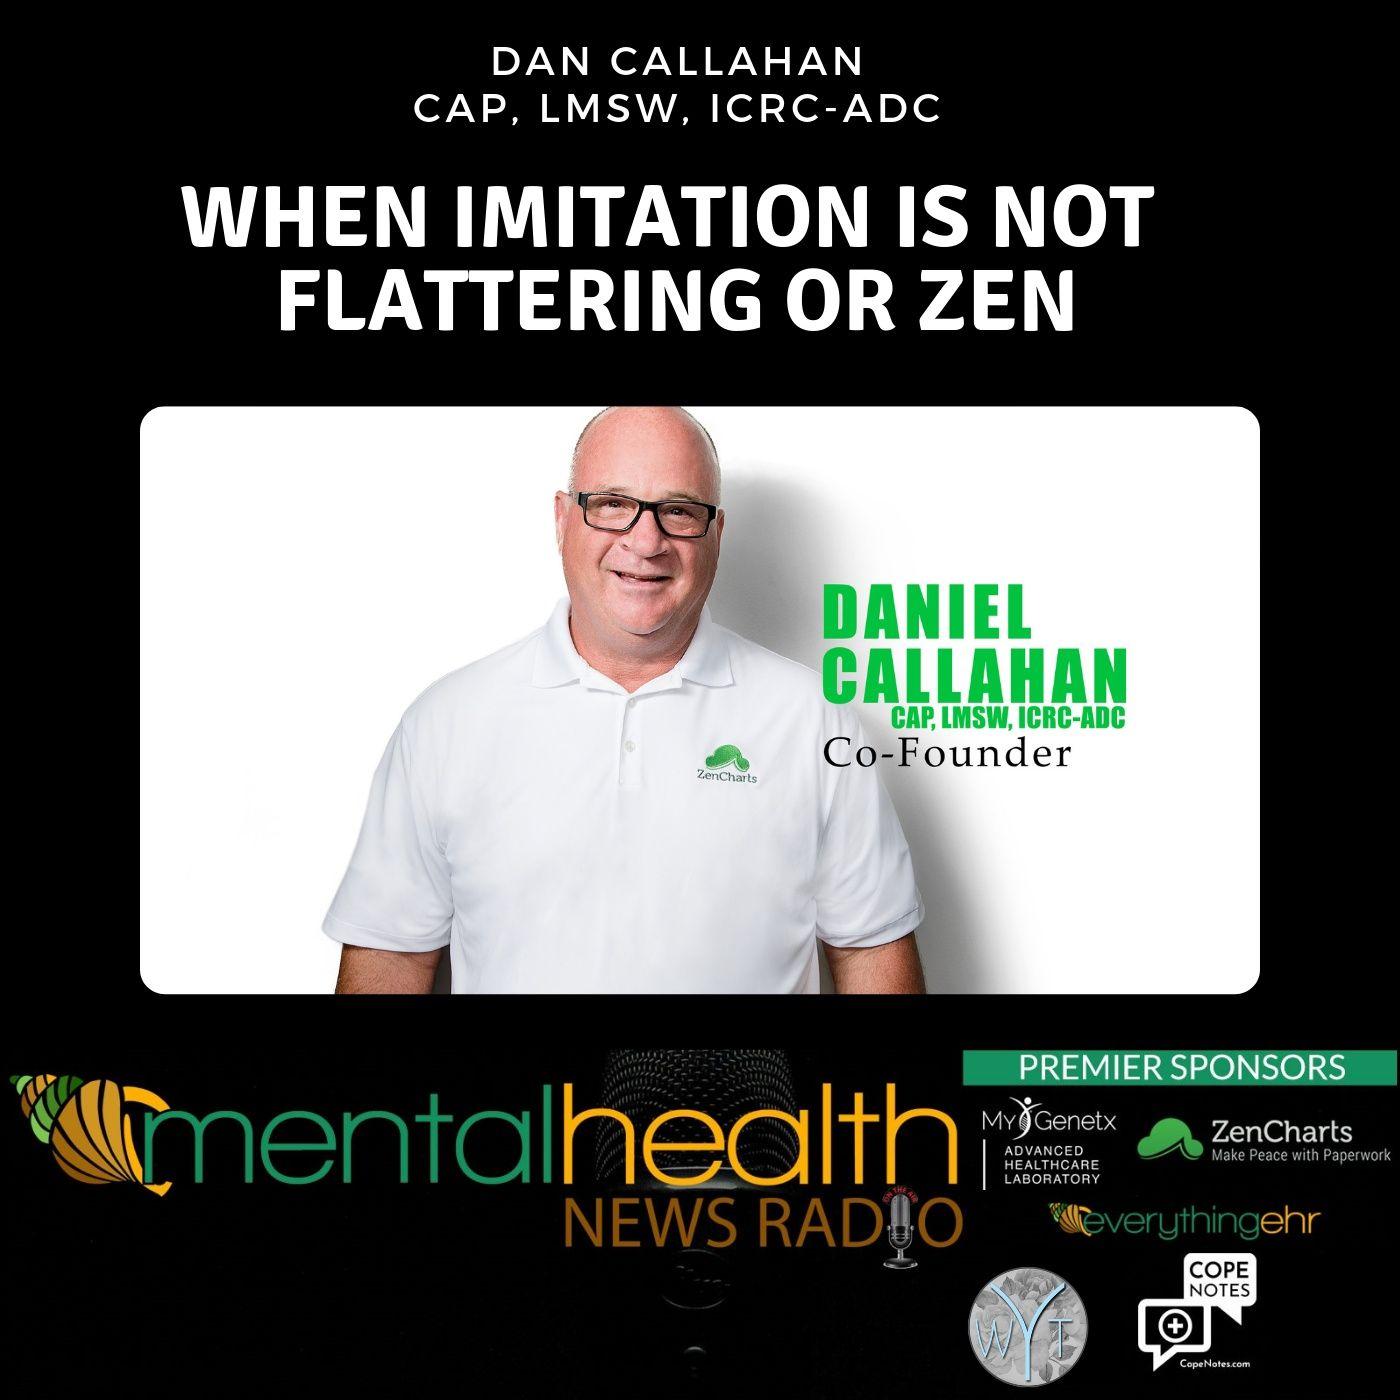 Mental Health News Radio - When Imitation is Not Flattering or Zen